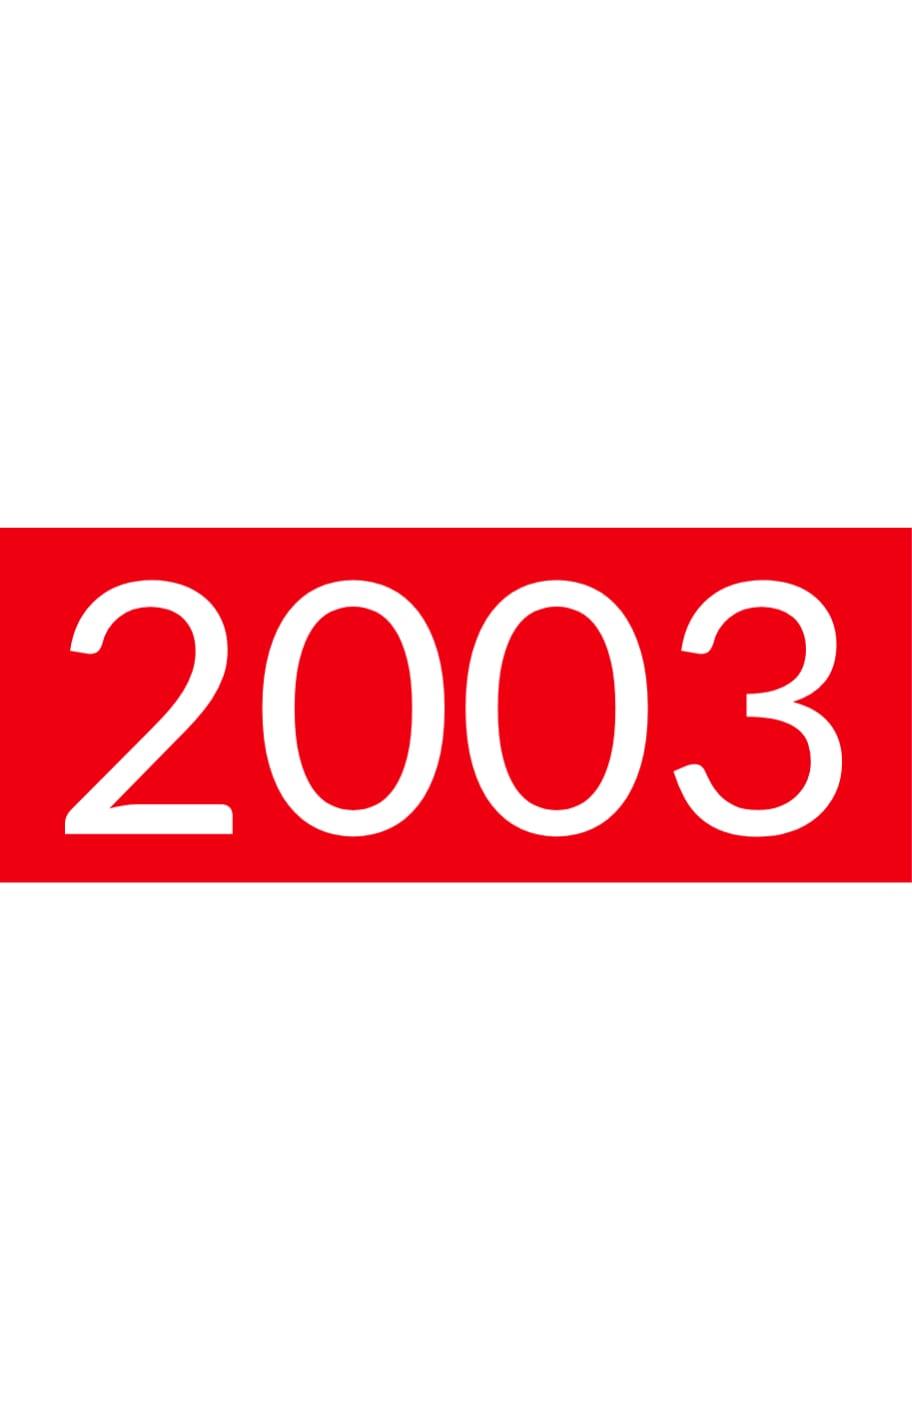 Orange rectangle with white text: 2003